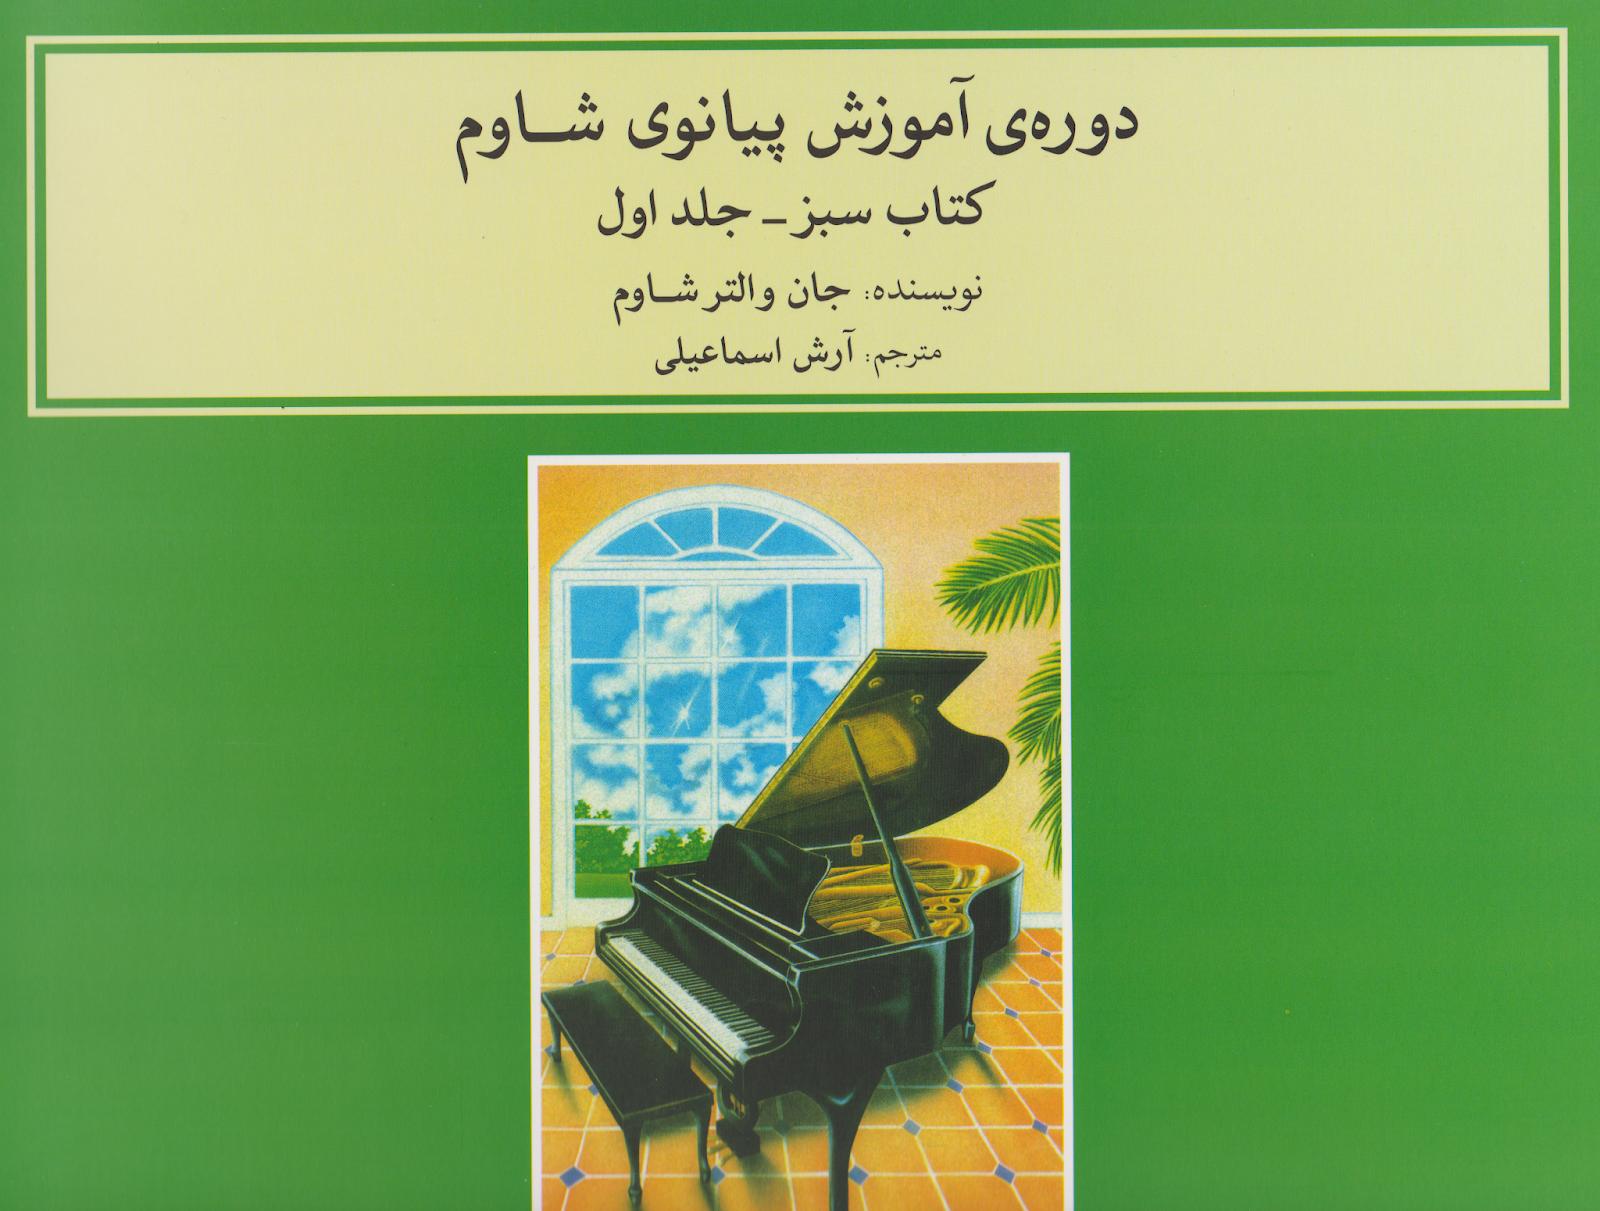 کتاب اول دورهی آموزش پیانوی شاوم آرش اسماعیلی انتشارات ماهور